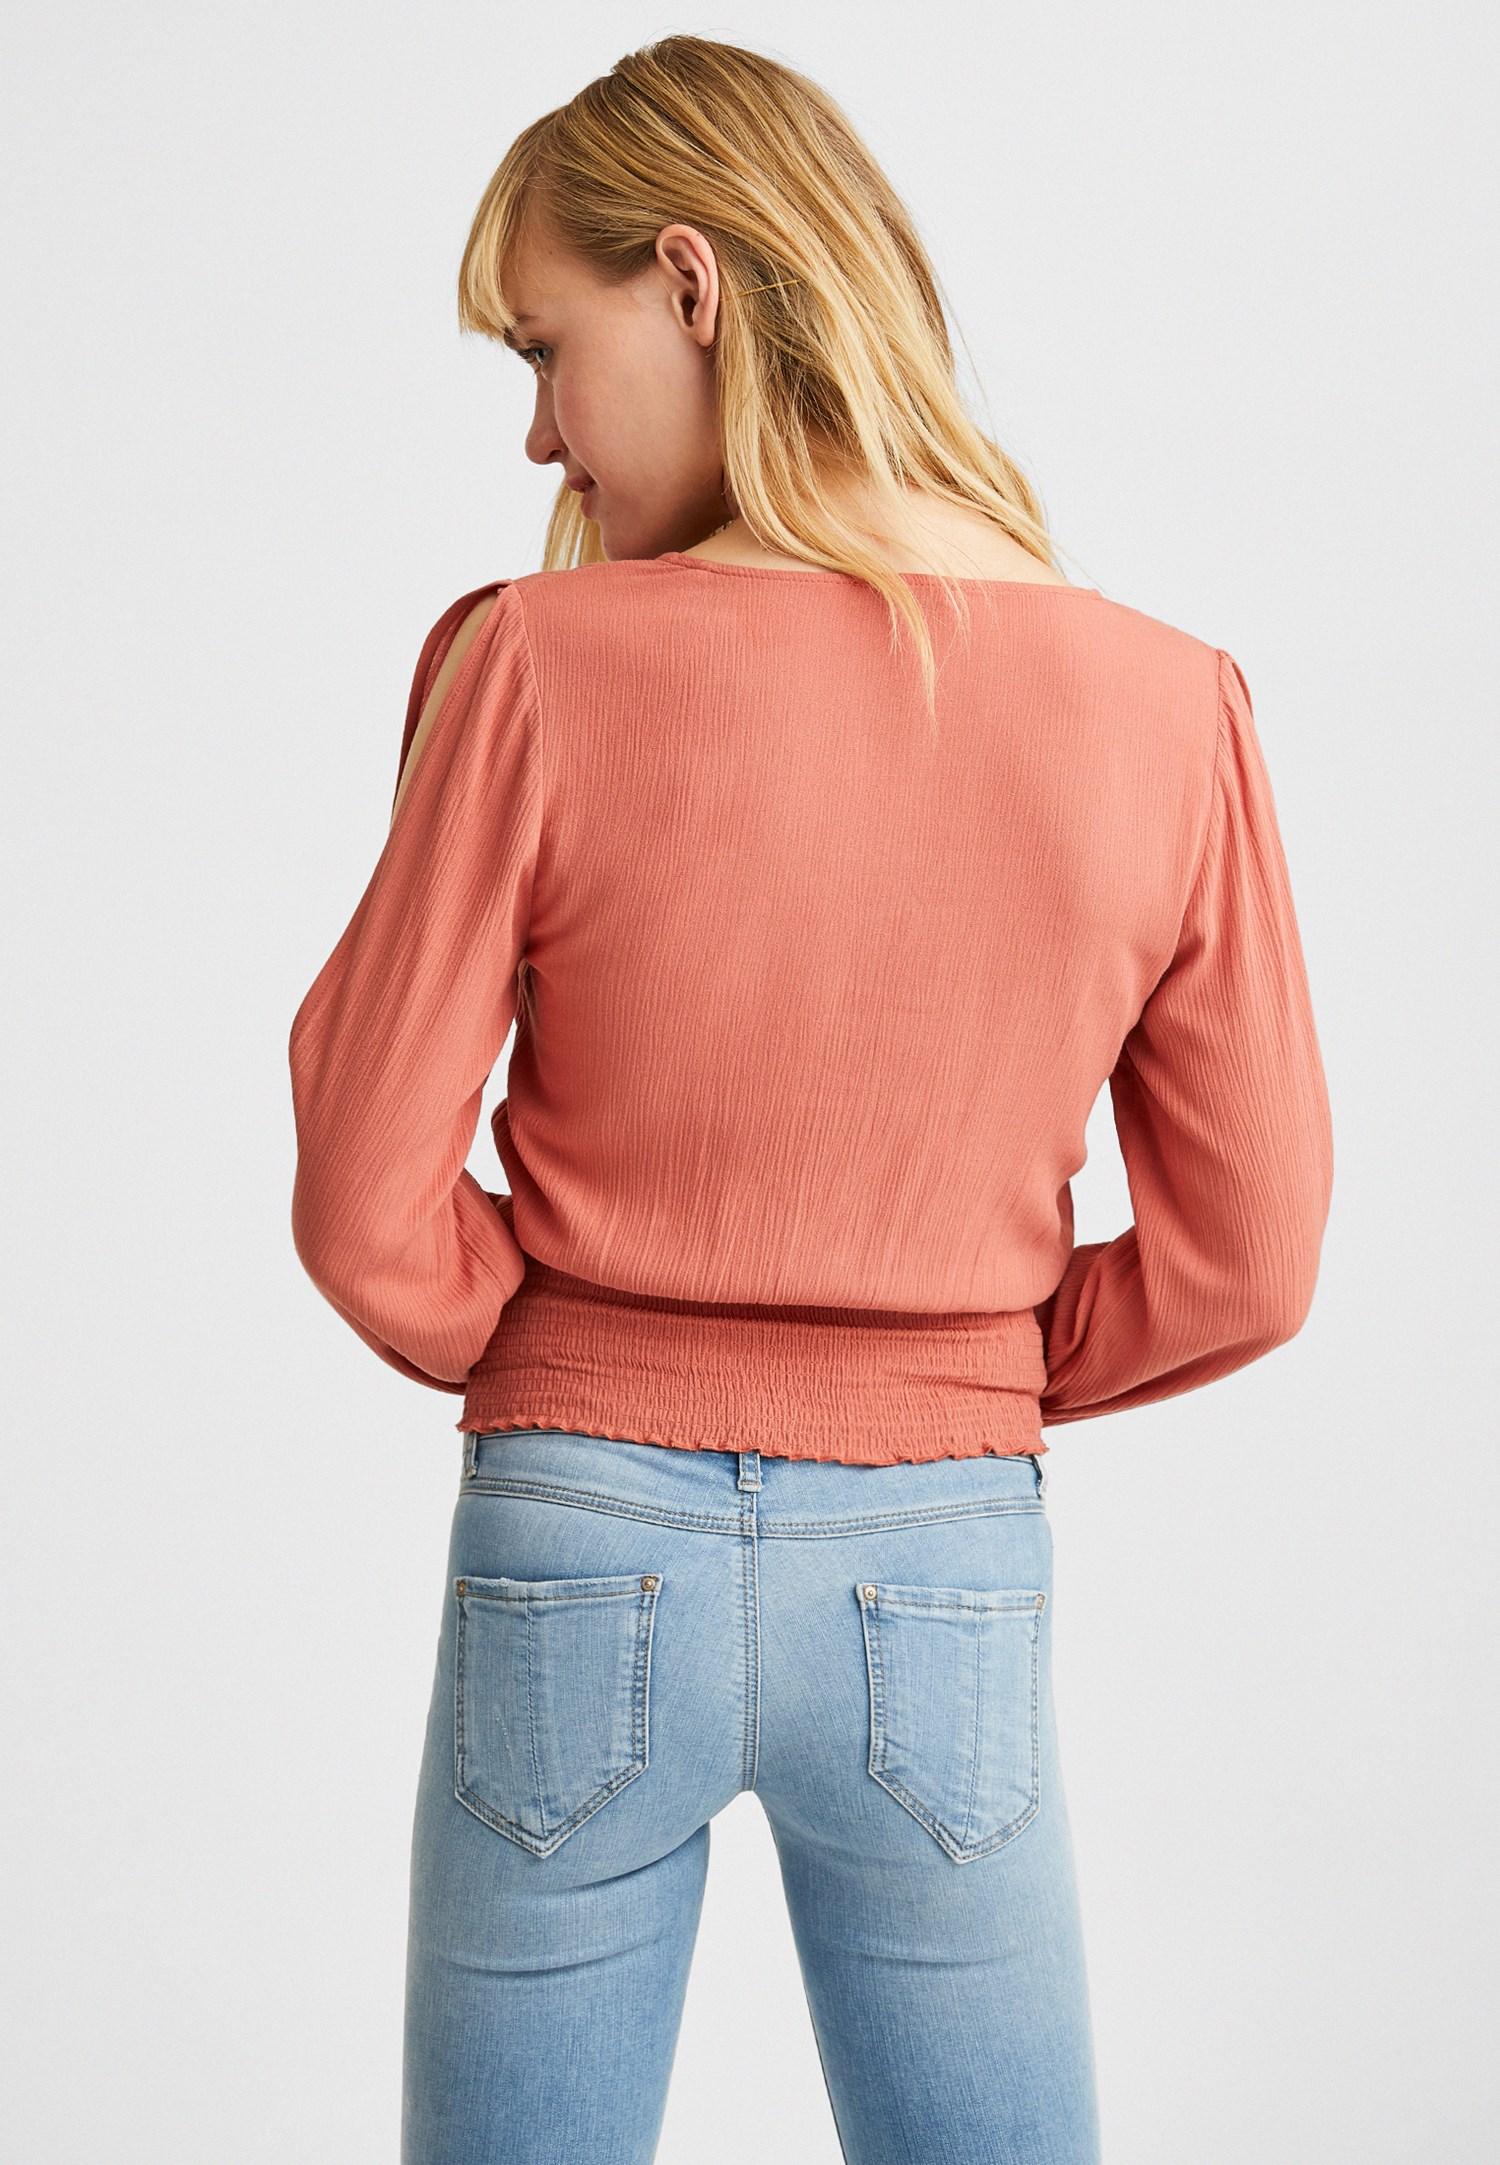 Bayan Turuncu Kol Detaylı Beli Lastikli Bluz